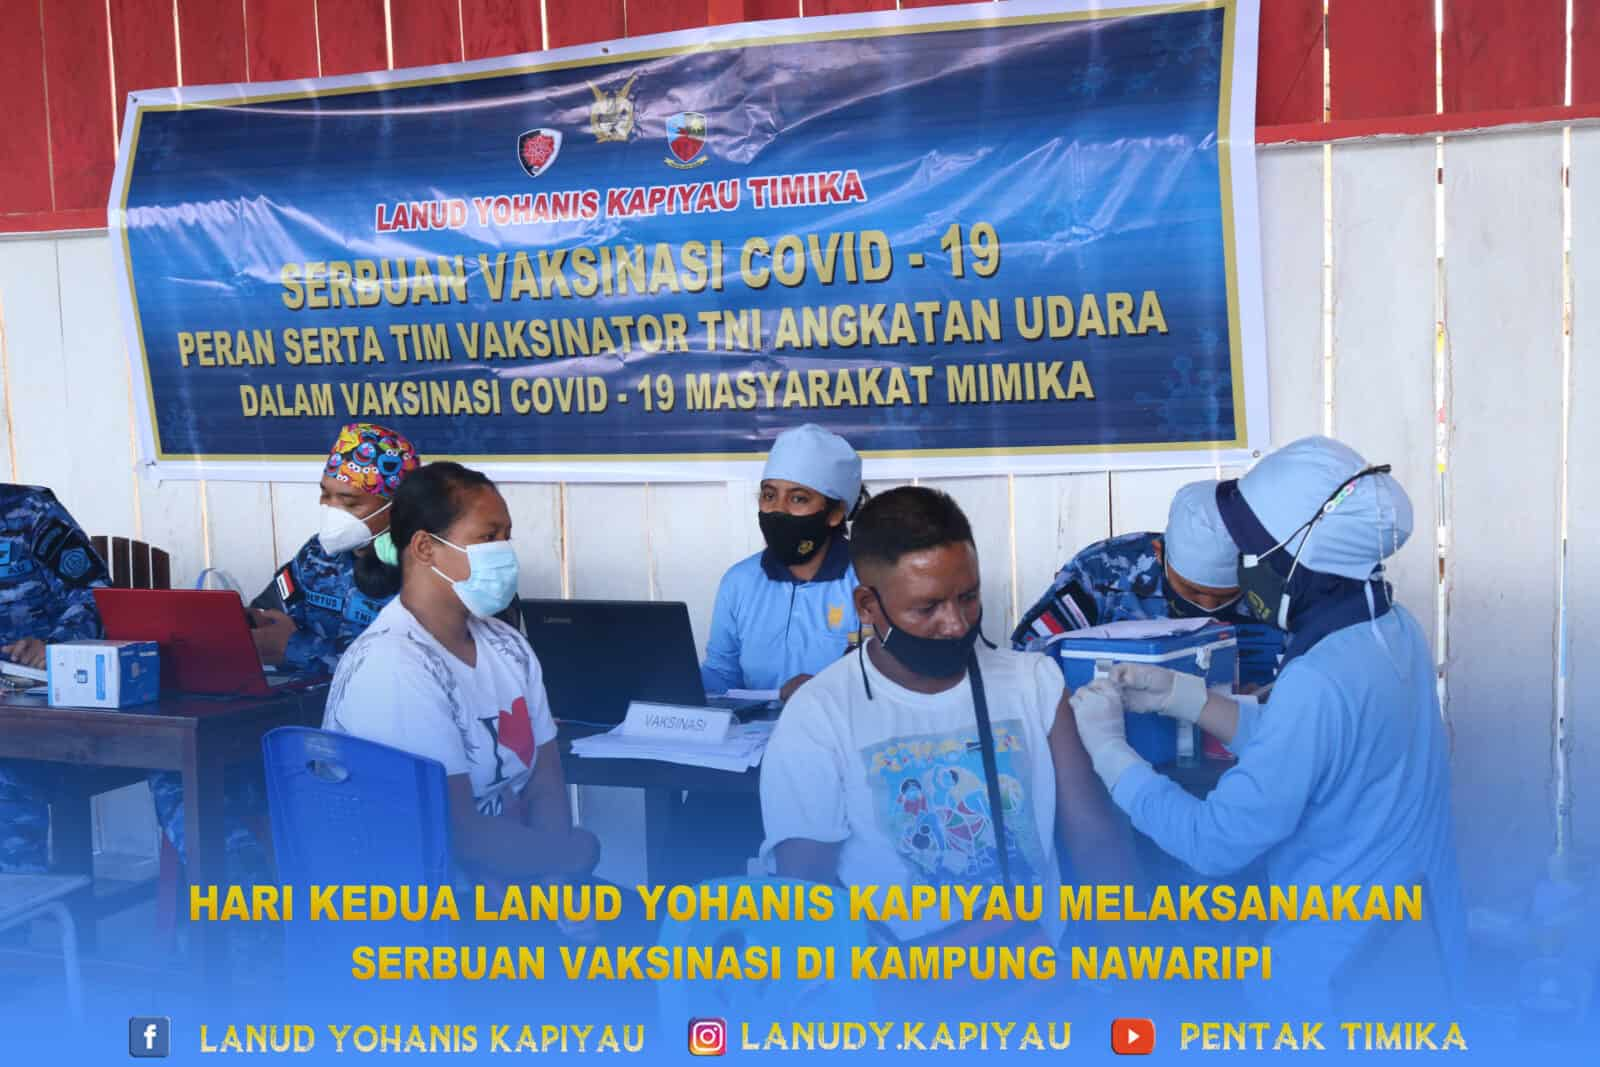 hari kedua vaksinasi di kampung nawaripi